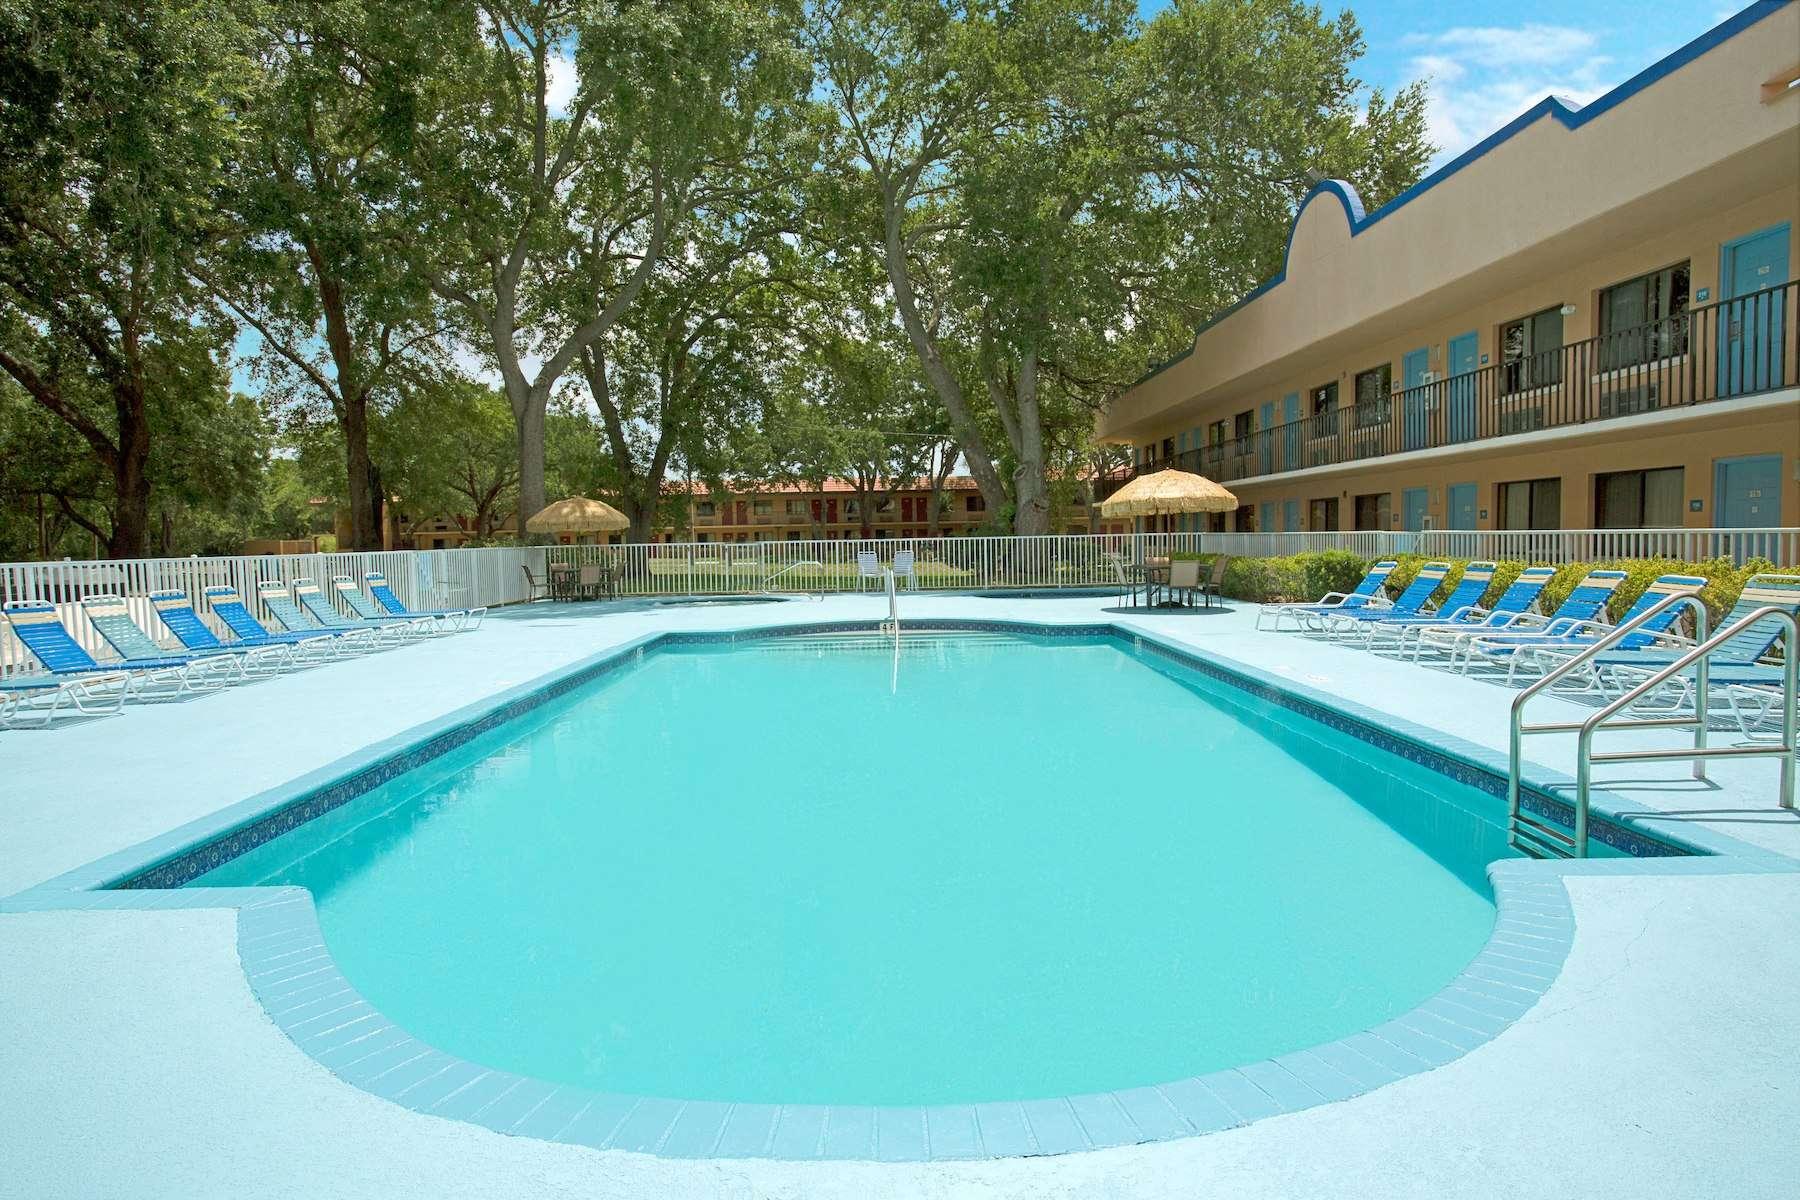 Travelodge Suites by Wyndham Kissimmee Orange pool area